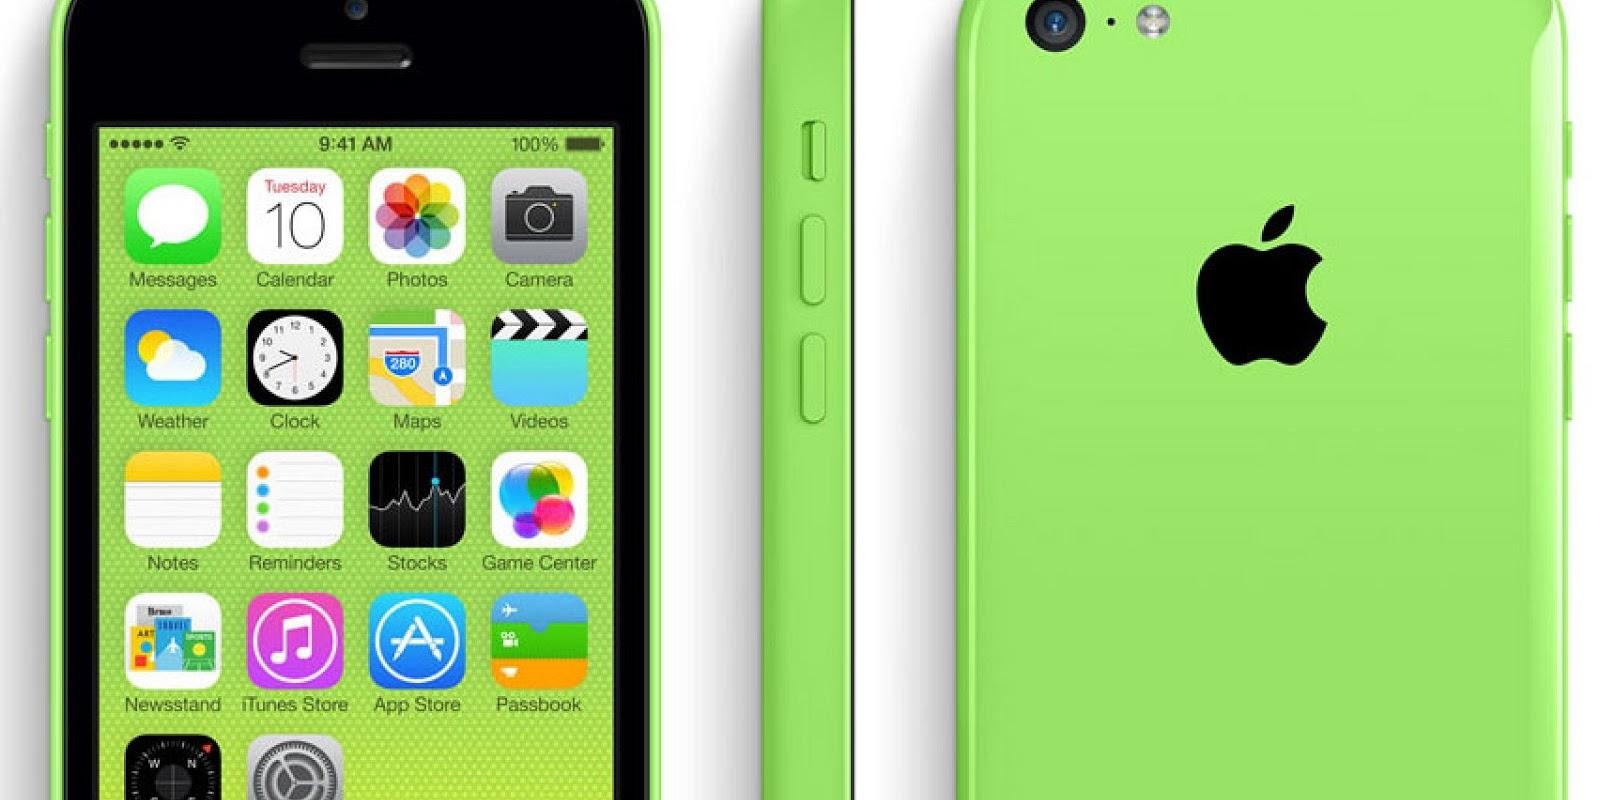 iPhone 5c Dengan Kamera 8MP Terbaru 2016 - Review Kelebihan dan kekurangan